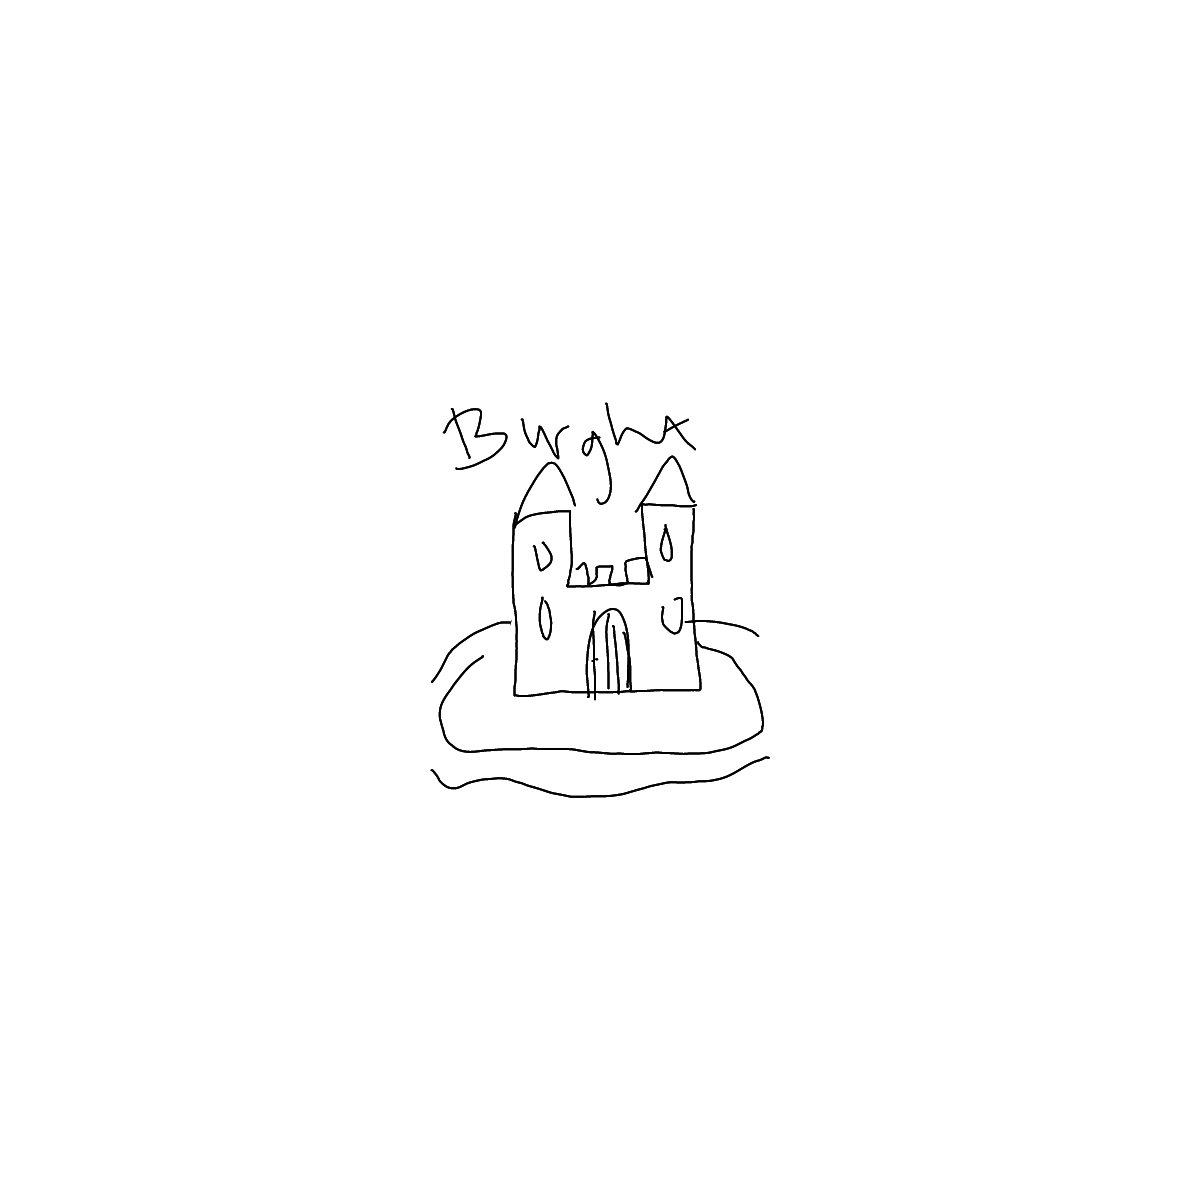 BAAAM drawing#6519 lat:52.1589889526367200lng: 4.4923968315124510